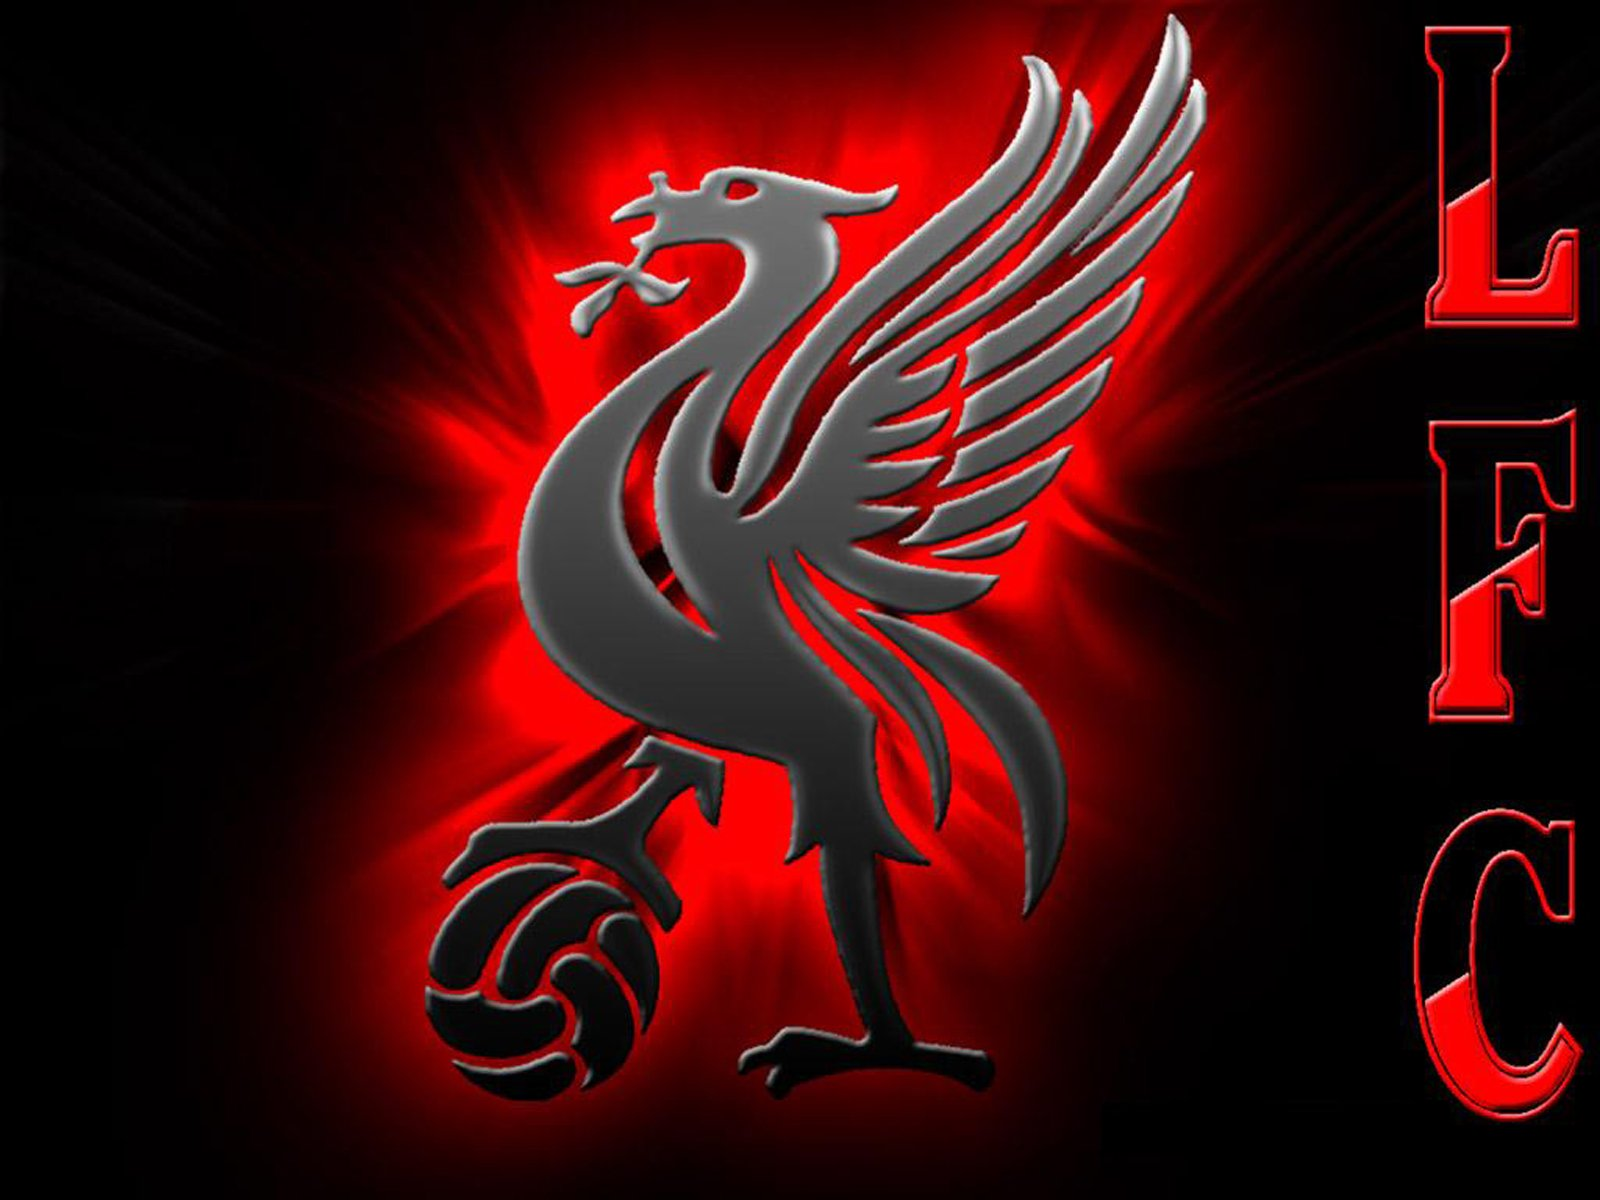 wallpapers hd for mac Liverpool FC Logo Wallpaper HD 2013 1600x1200